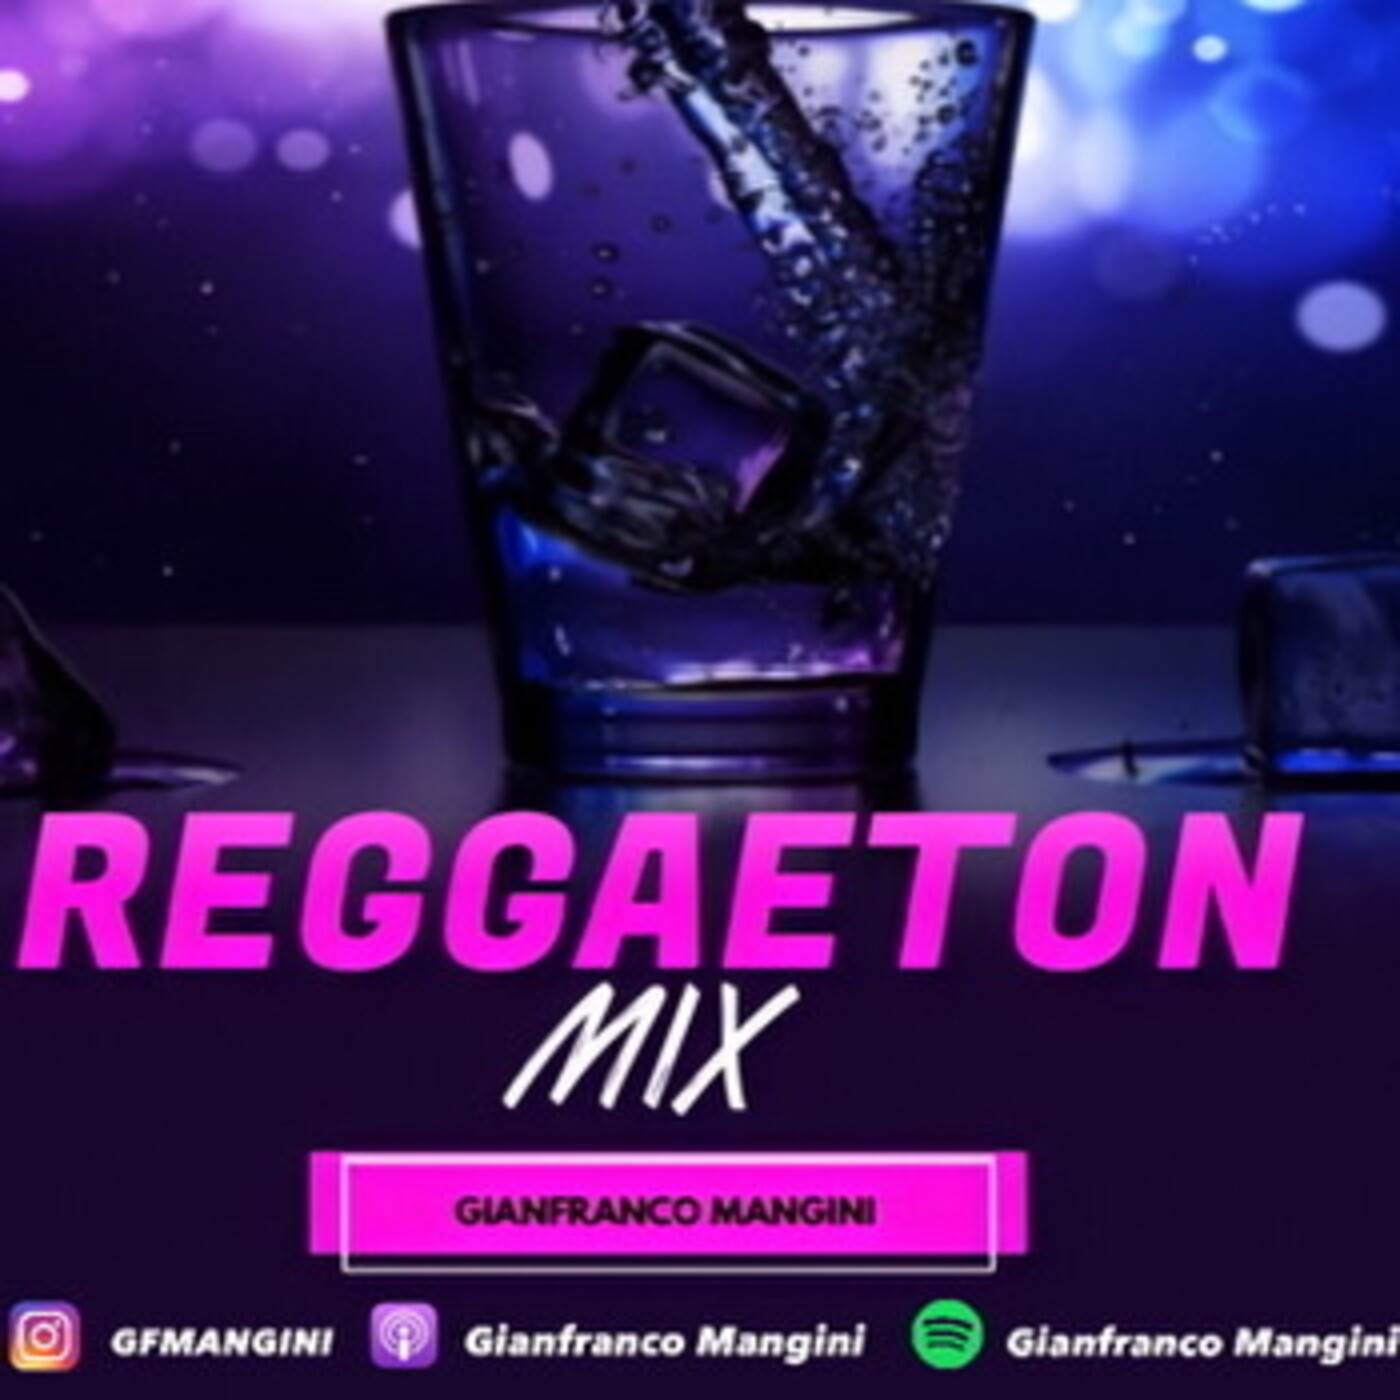 Reggaeton en cuarentena ep. I